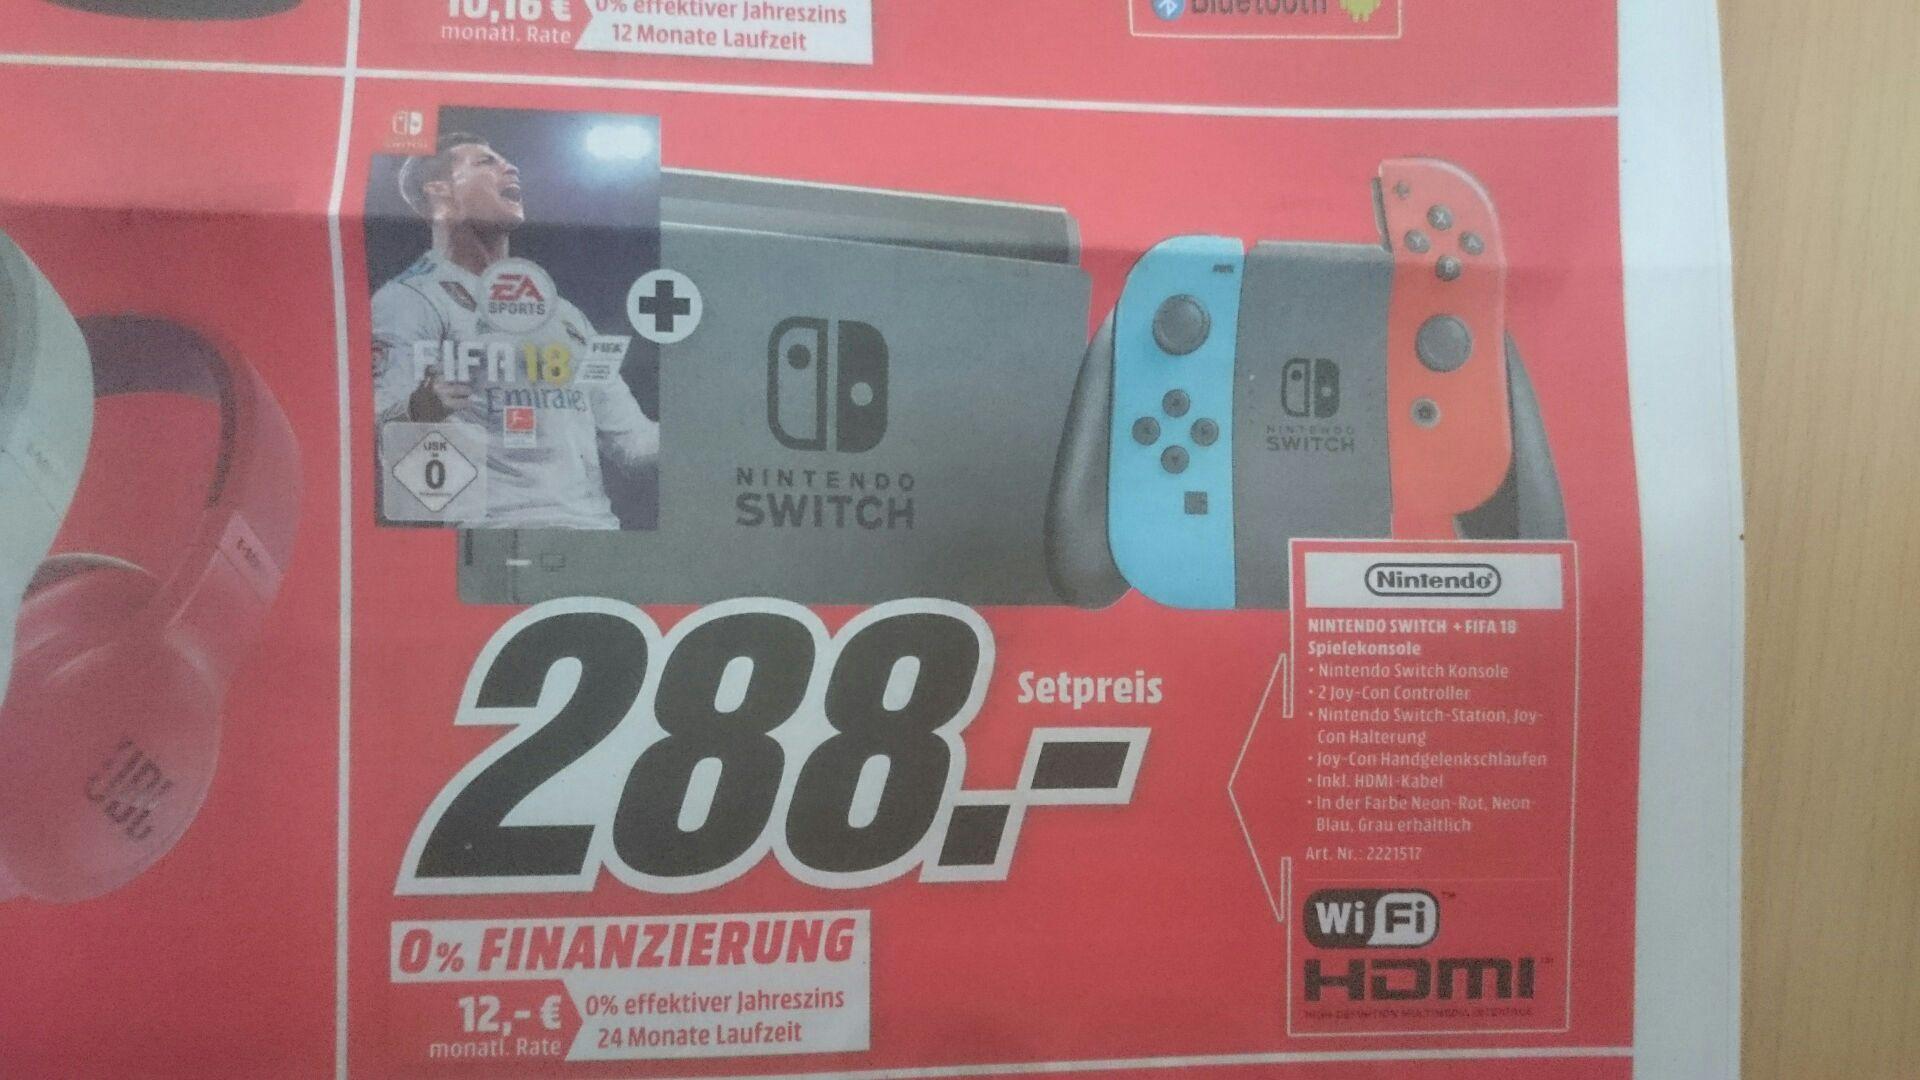 [Lokal] Media Markt Belm-Osnabrück Nintendo Switch inkl Fifa 18